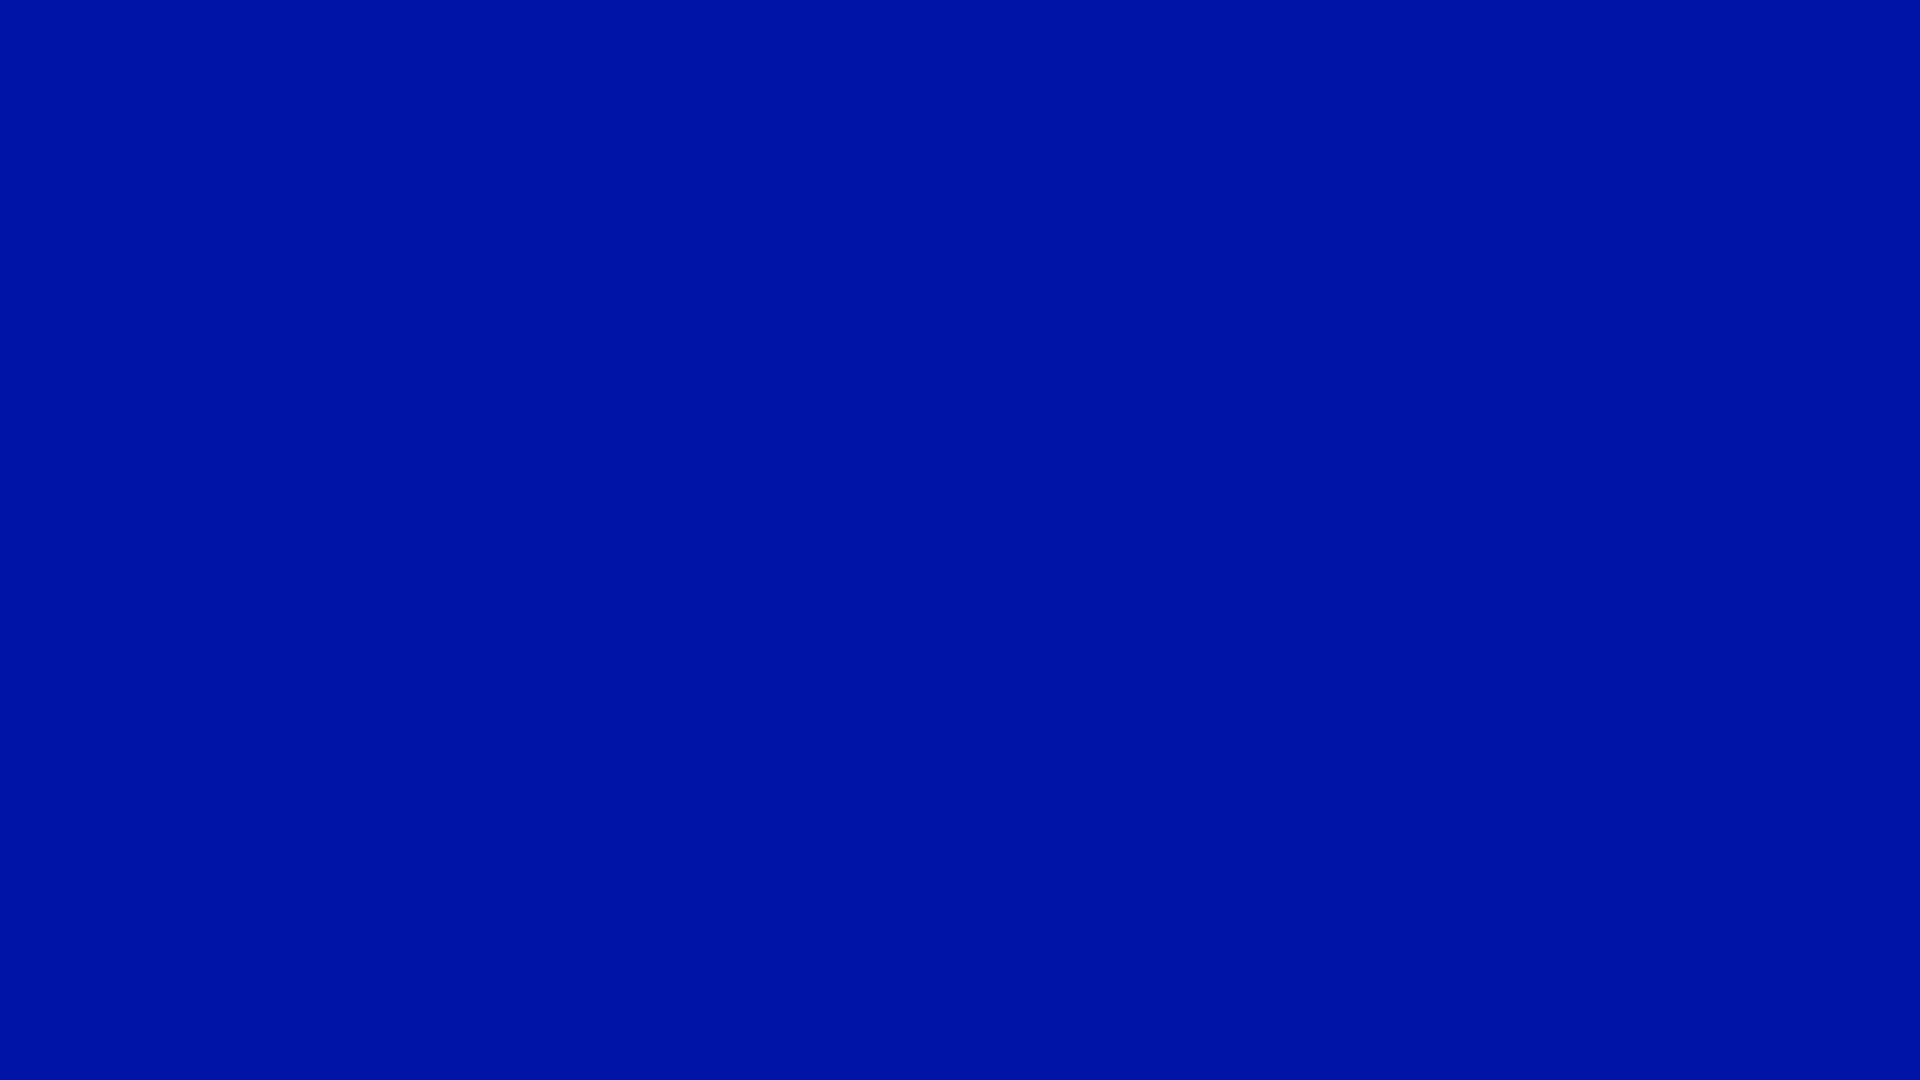 1920x1080 Zaffre Solid Color Background